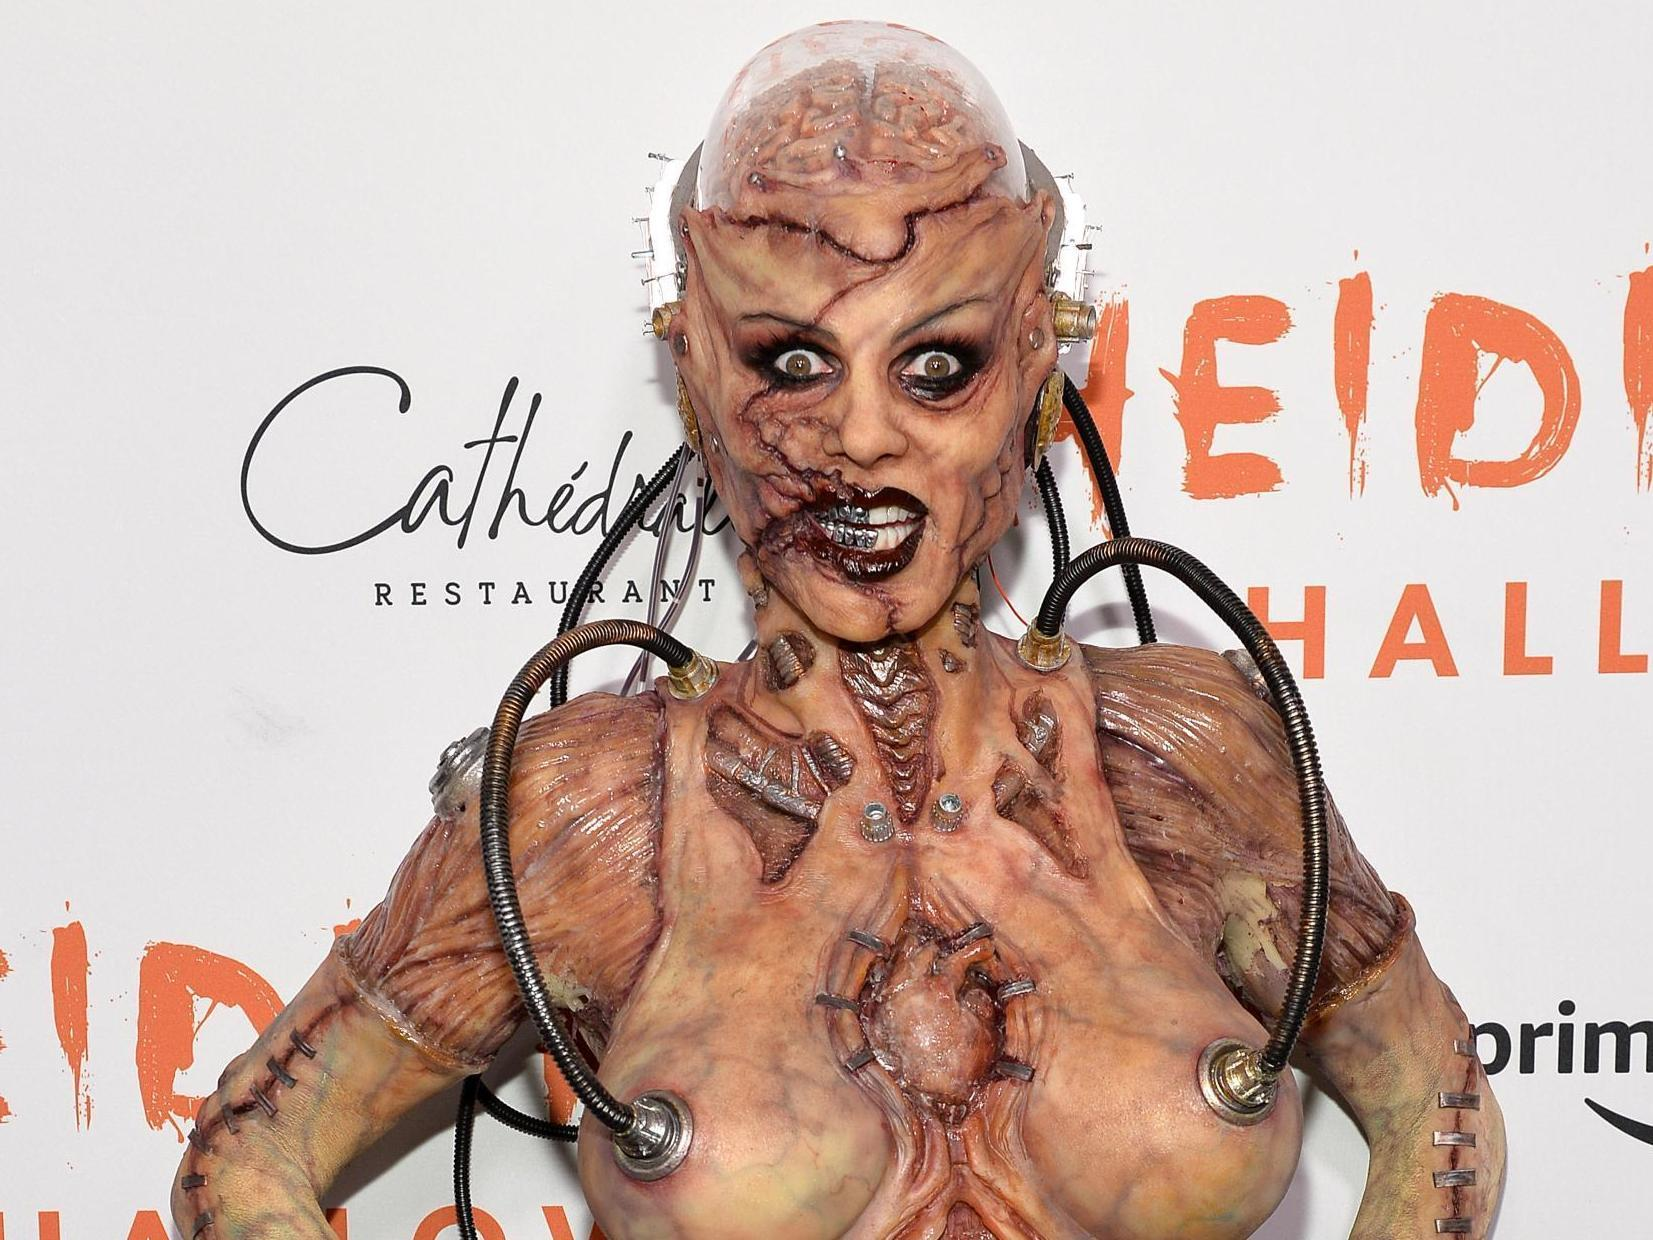 Heidi Klum leads gruesome celebrity Halloween costumes as terrifying alien